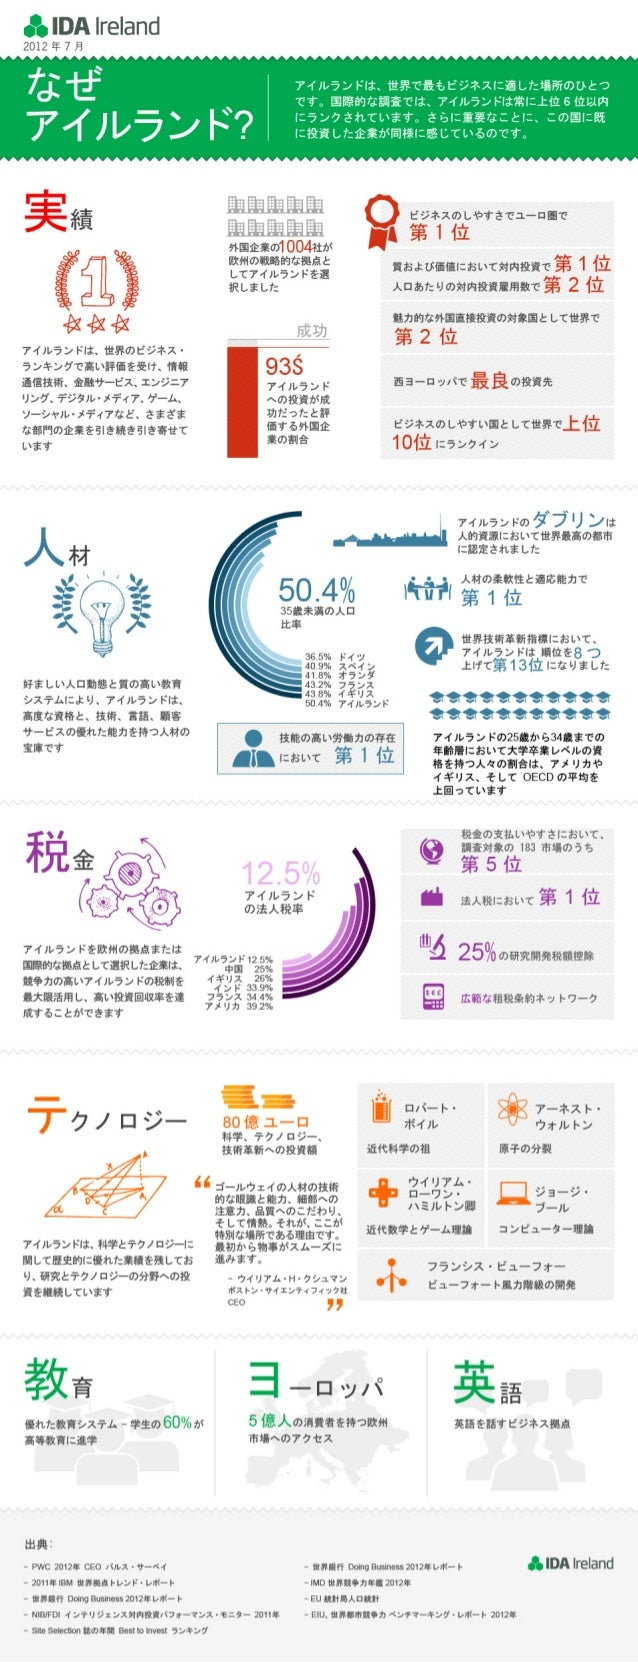 Japanese Version - Why Ireland Infographic